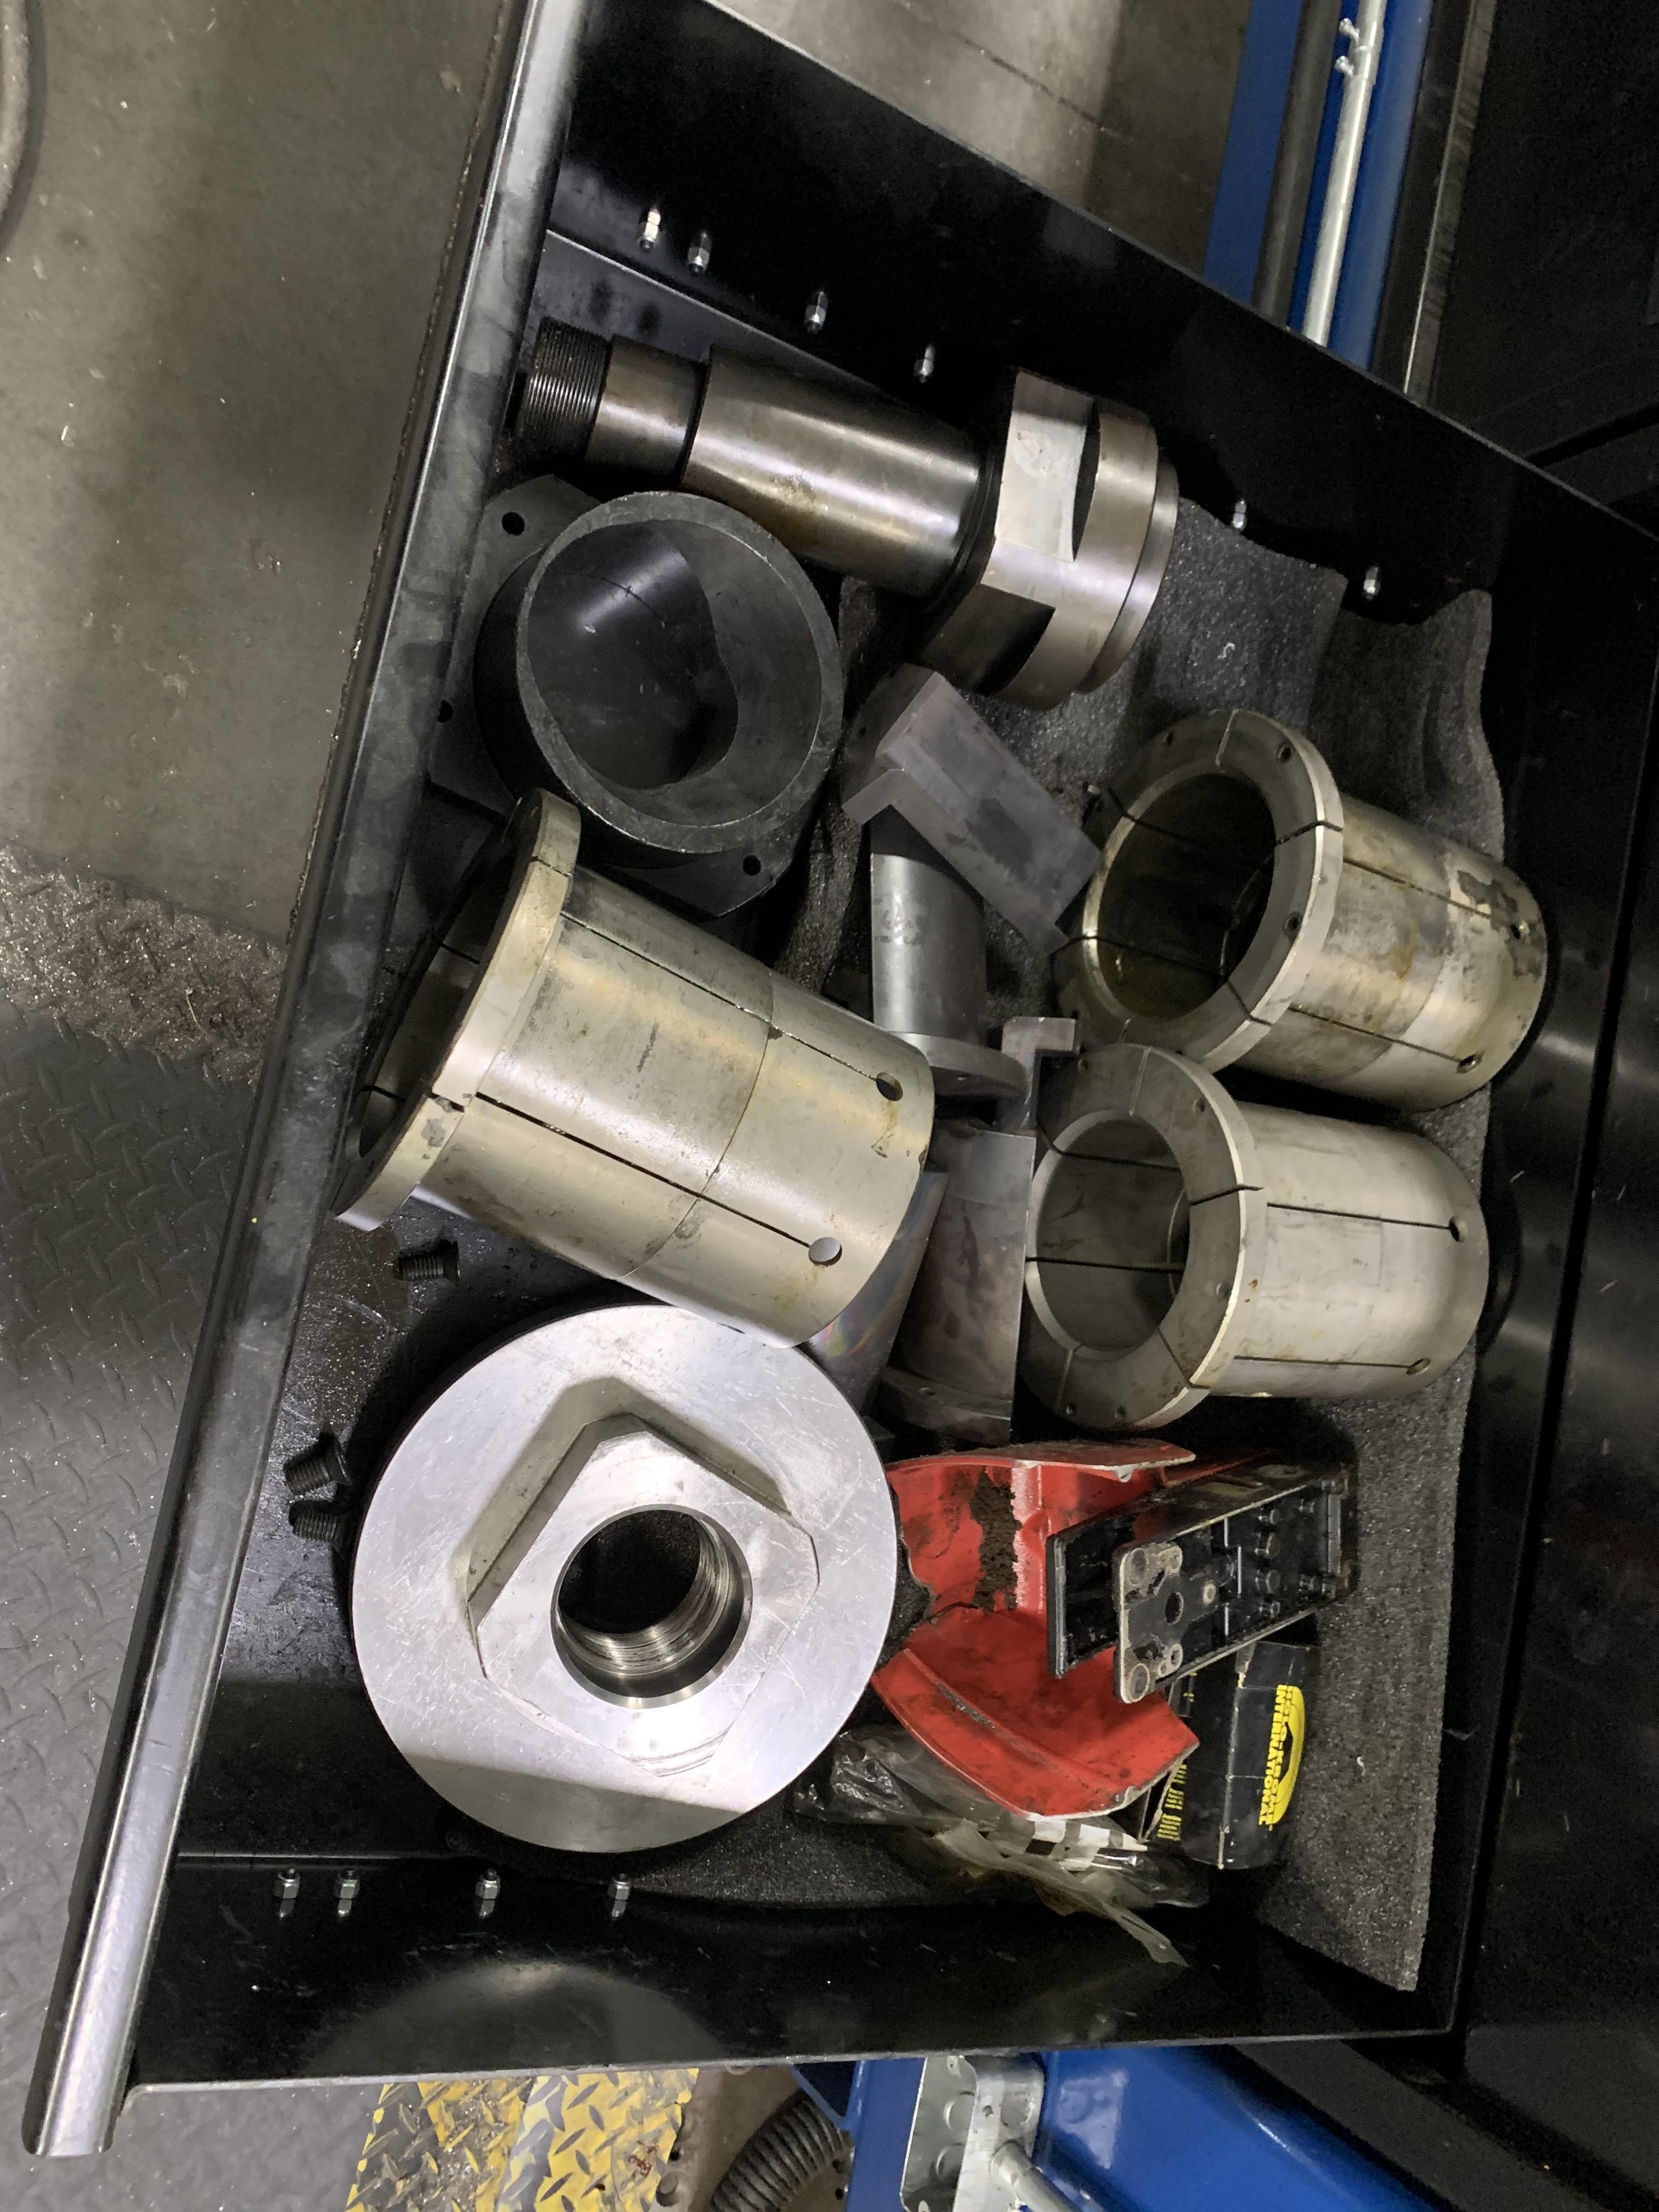 "6"" UNISON MODEL 6"" MS RH ELECTRIC CNC MULTI-STACK TUBE BENDER; S/N 2715, JOB NO. ME 4-410,(NEW 2014) - Image 52 of 72"